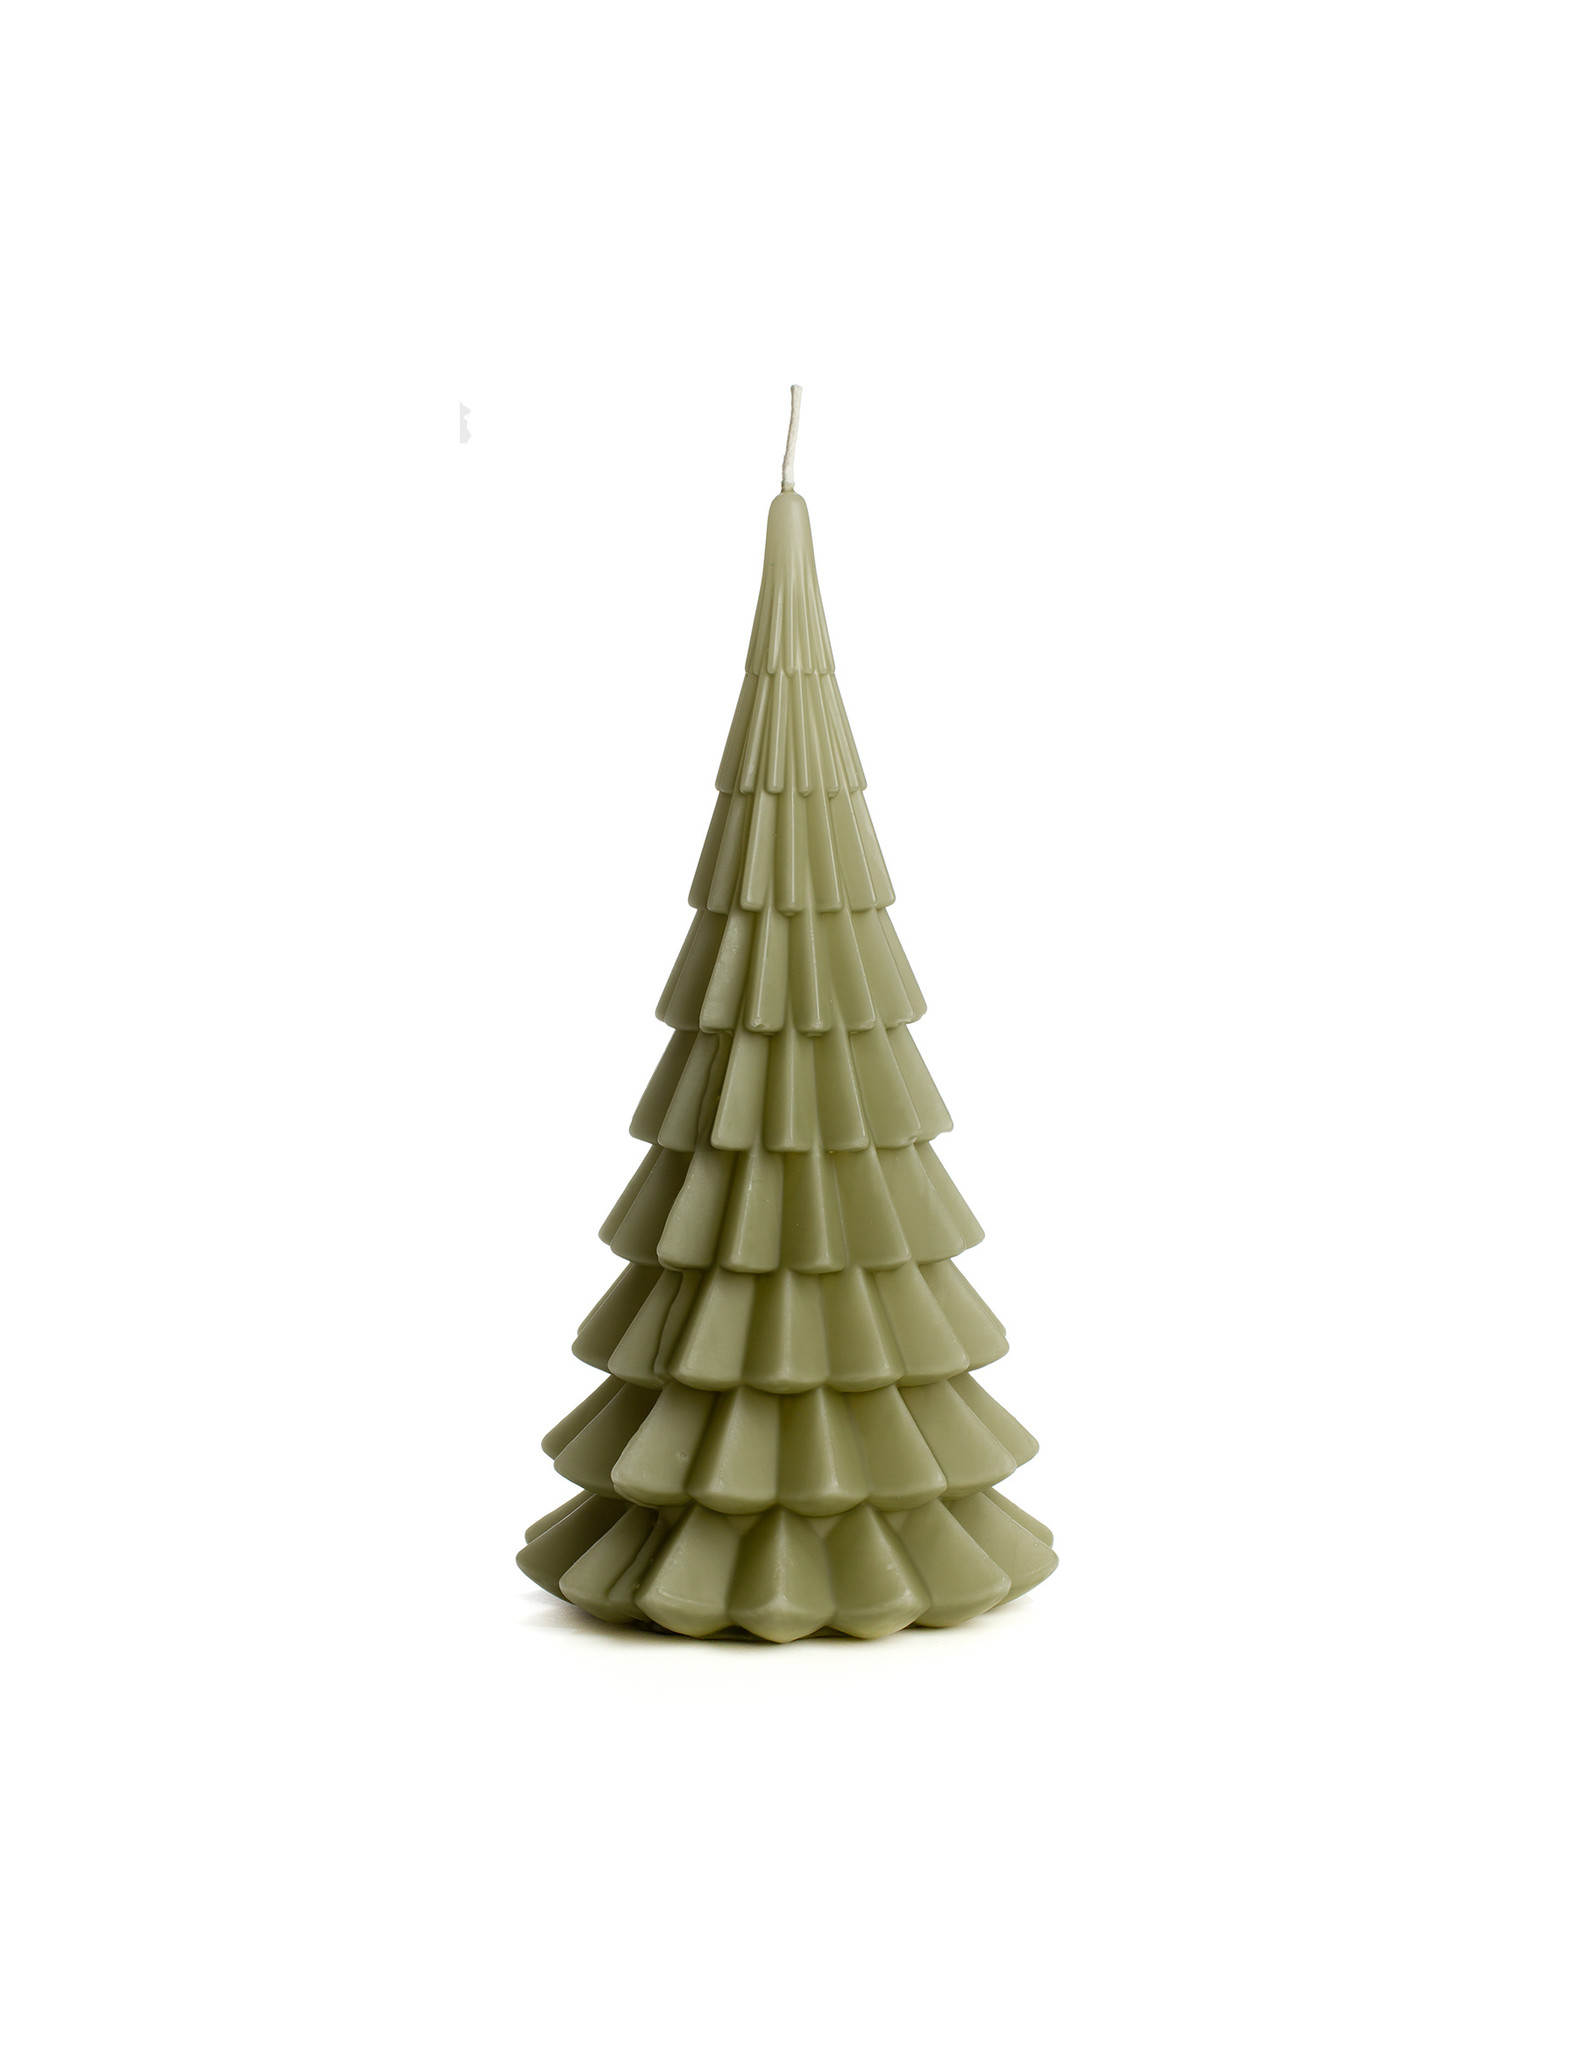 Outdoor kerstboomkaars XL van Rustik Lys